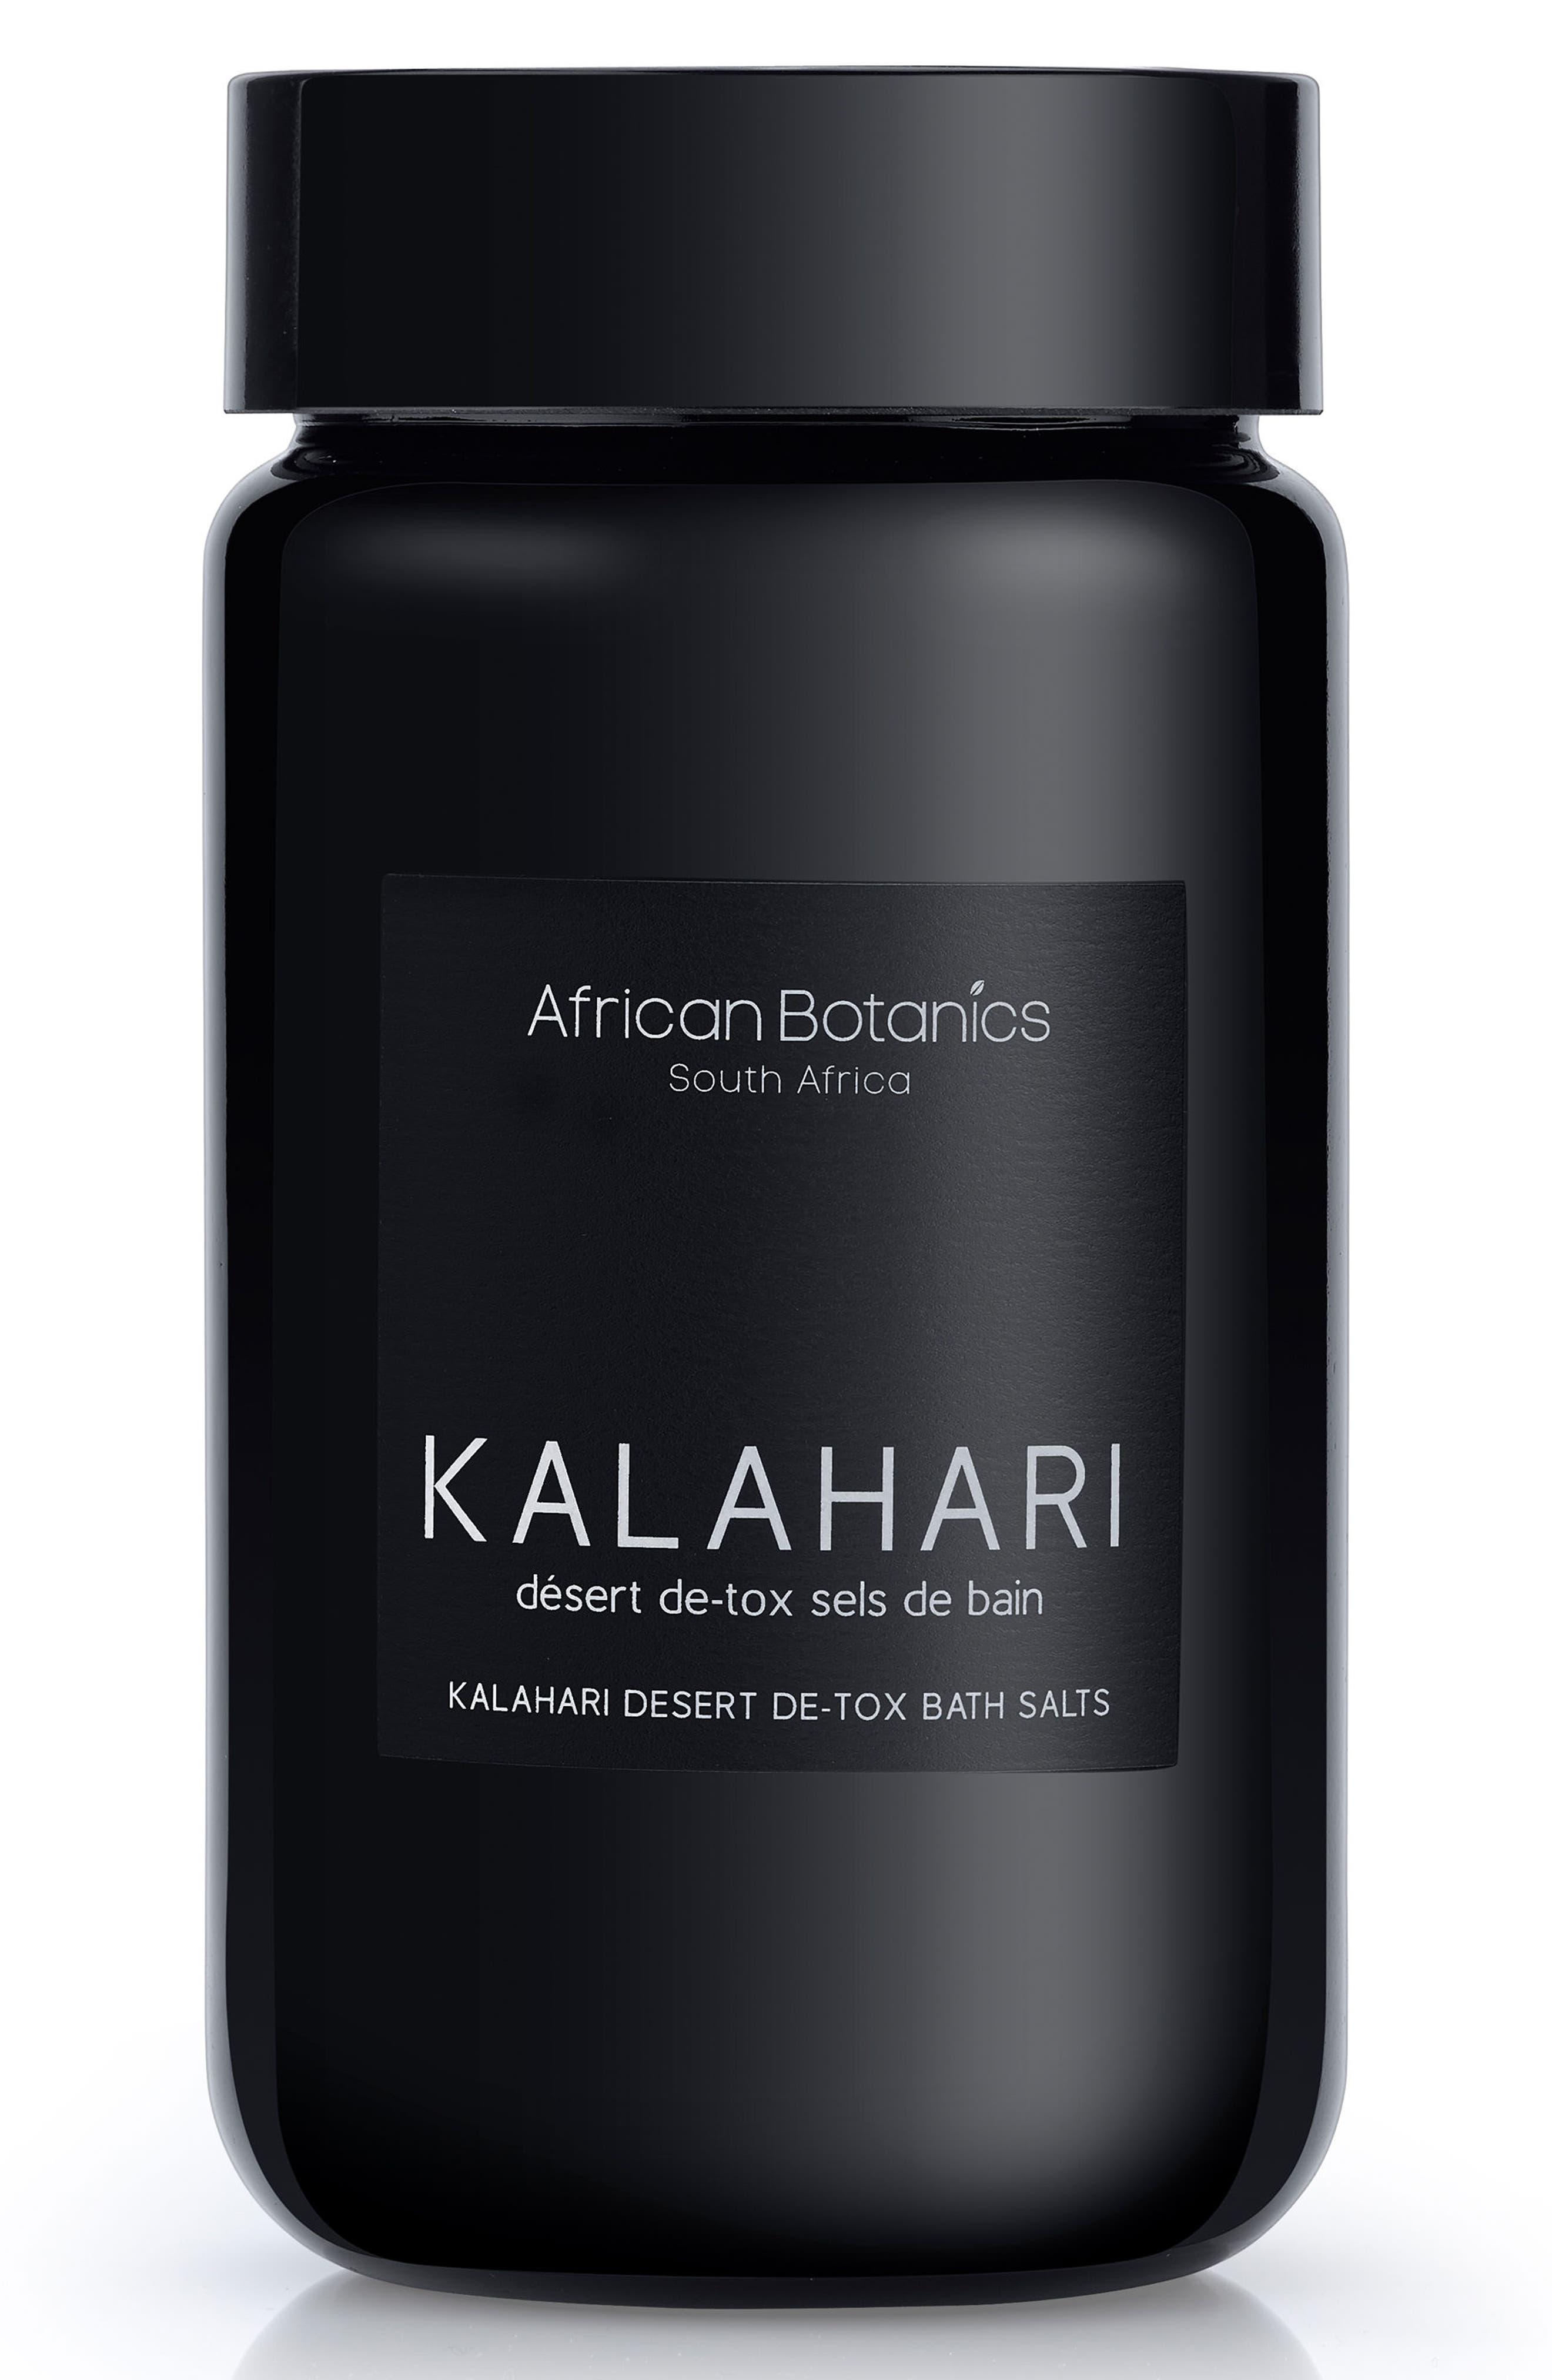 Main Image - African Botanics Kalahari Desert Detox Bath Salts